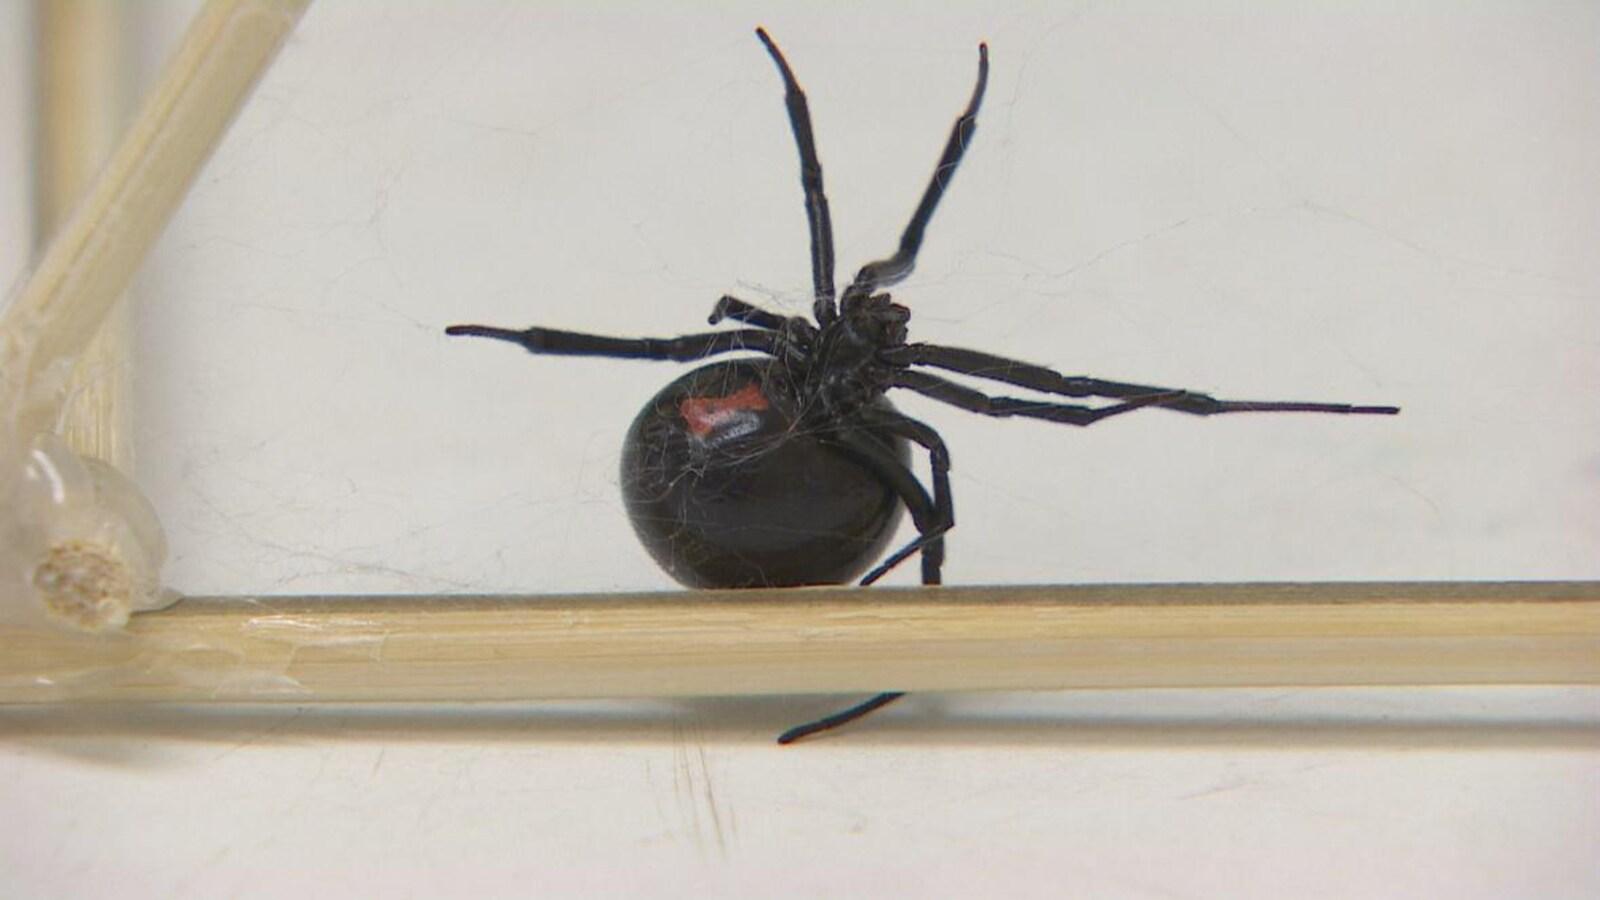 Une araignée tisse une fine toile.